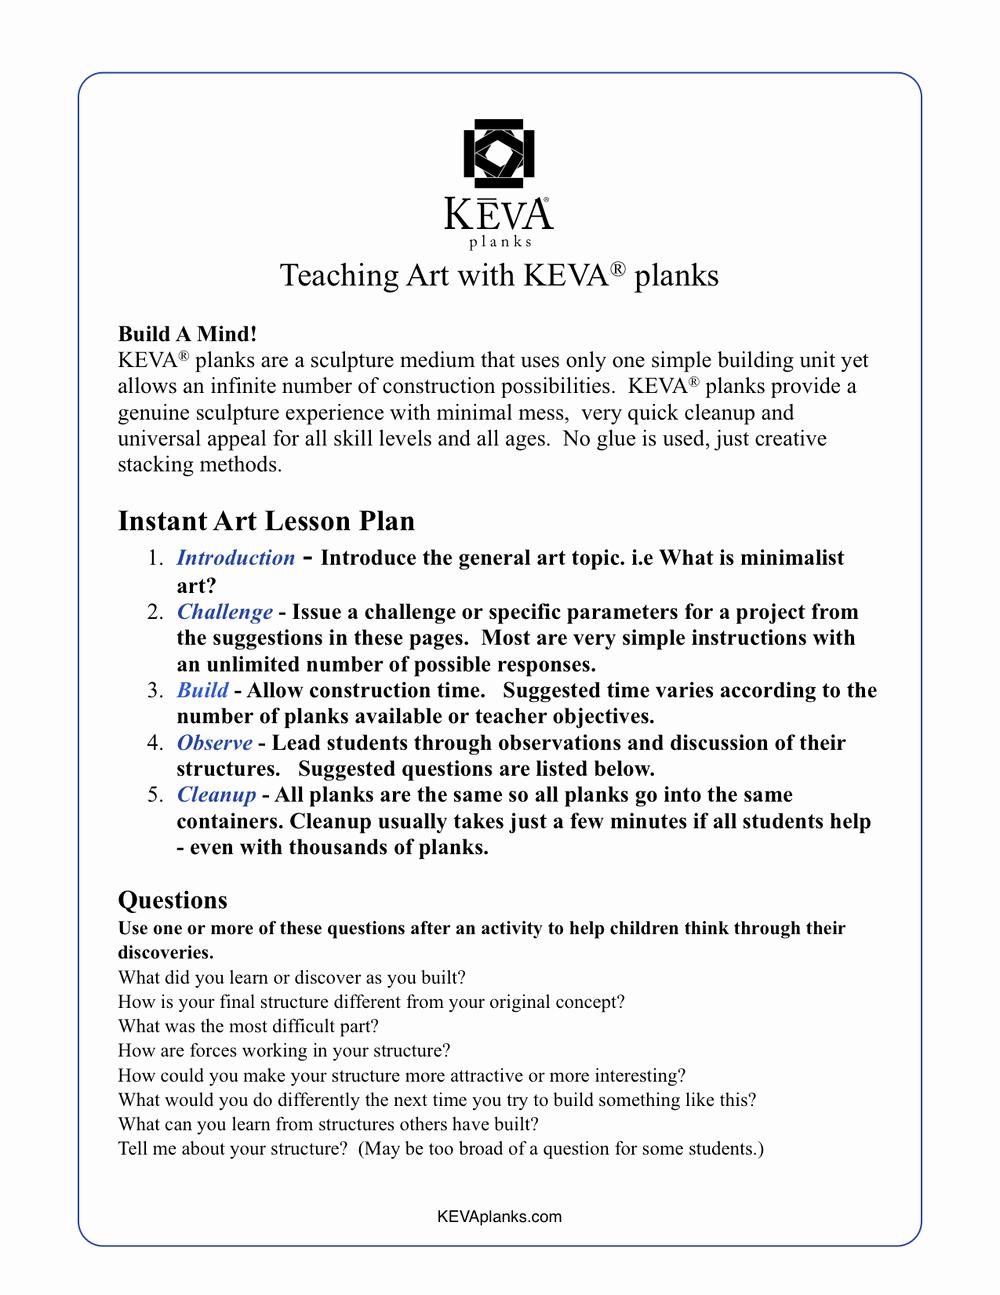 Art Lesson Plan Template Inspirational Lesson Plans Challenges Games & Activities — Keva Planks